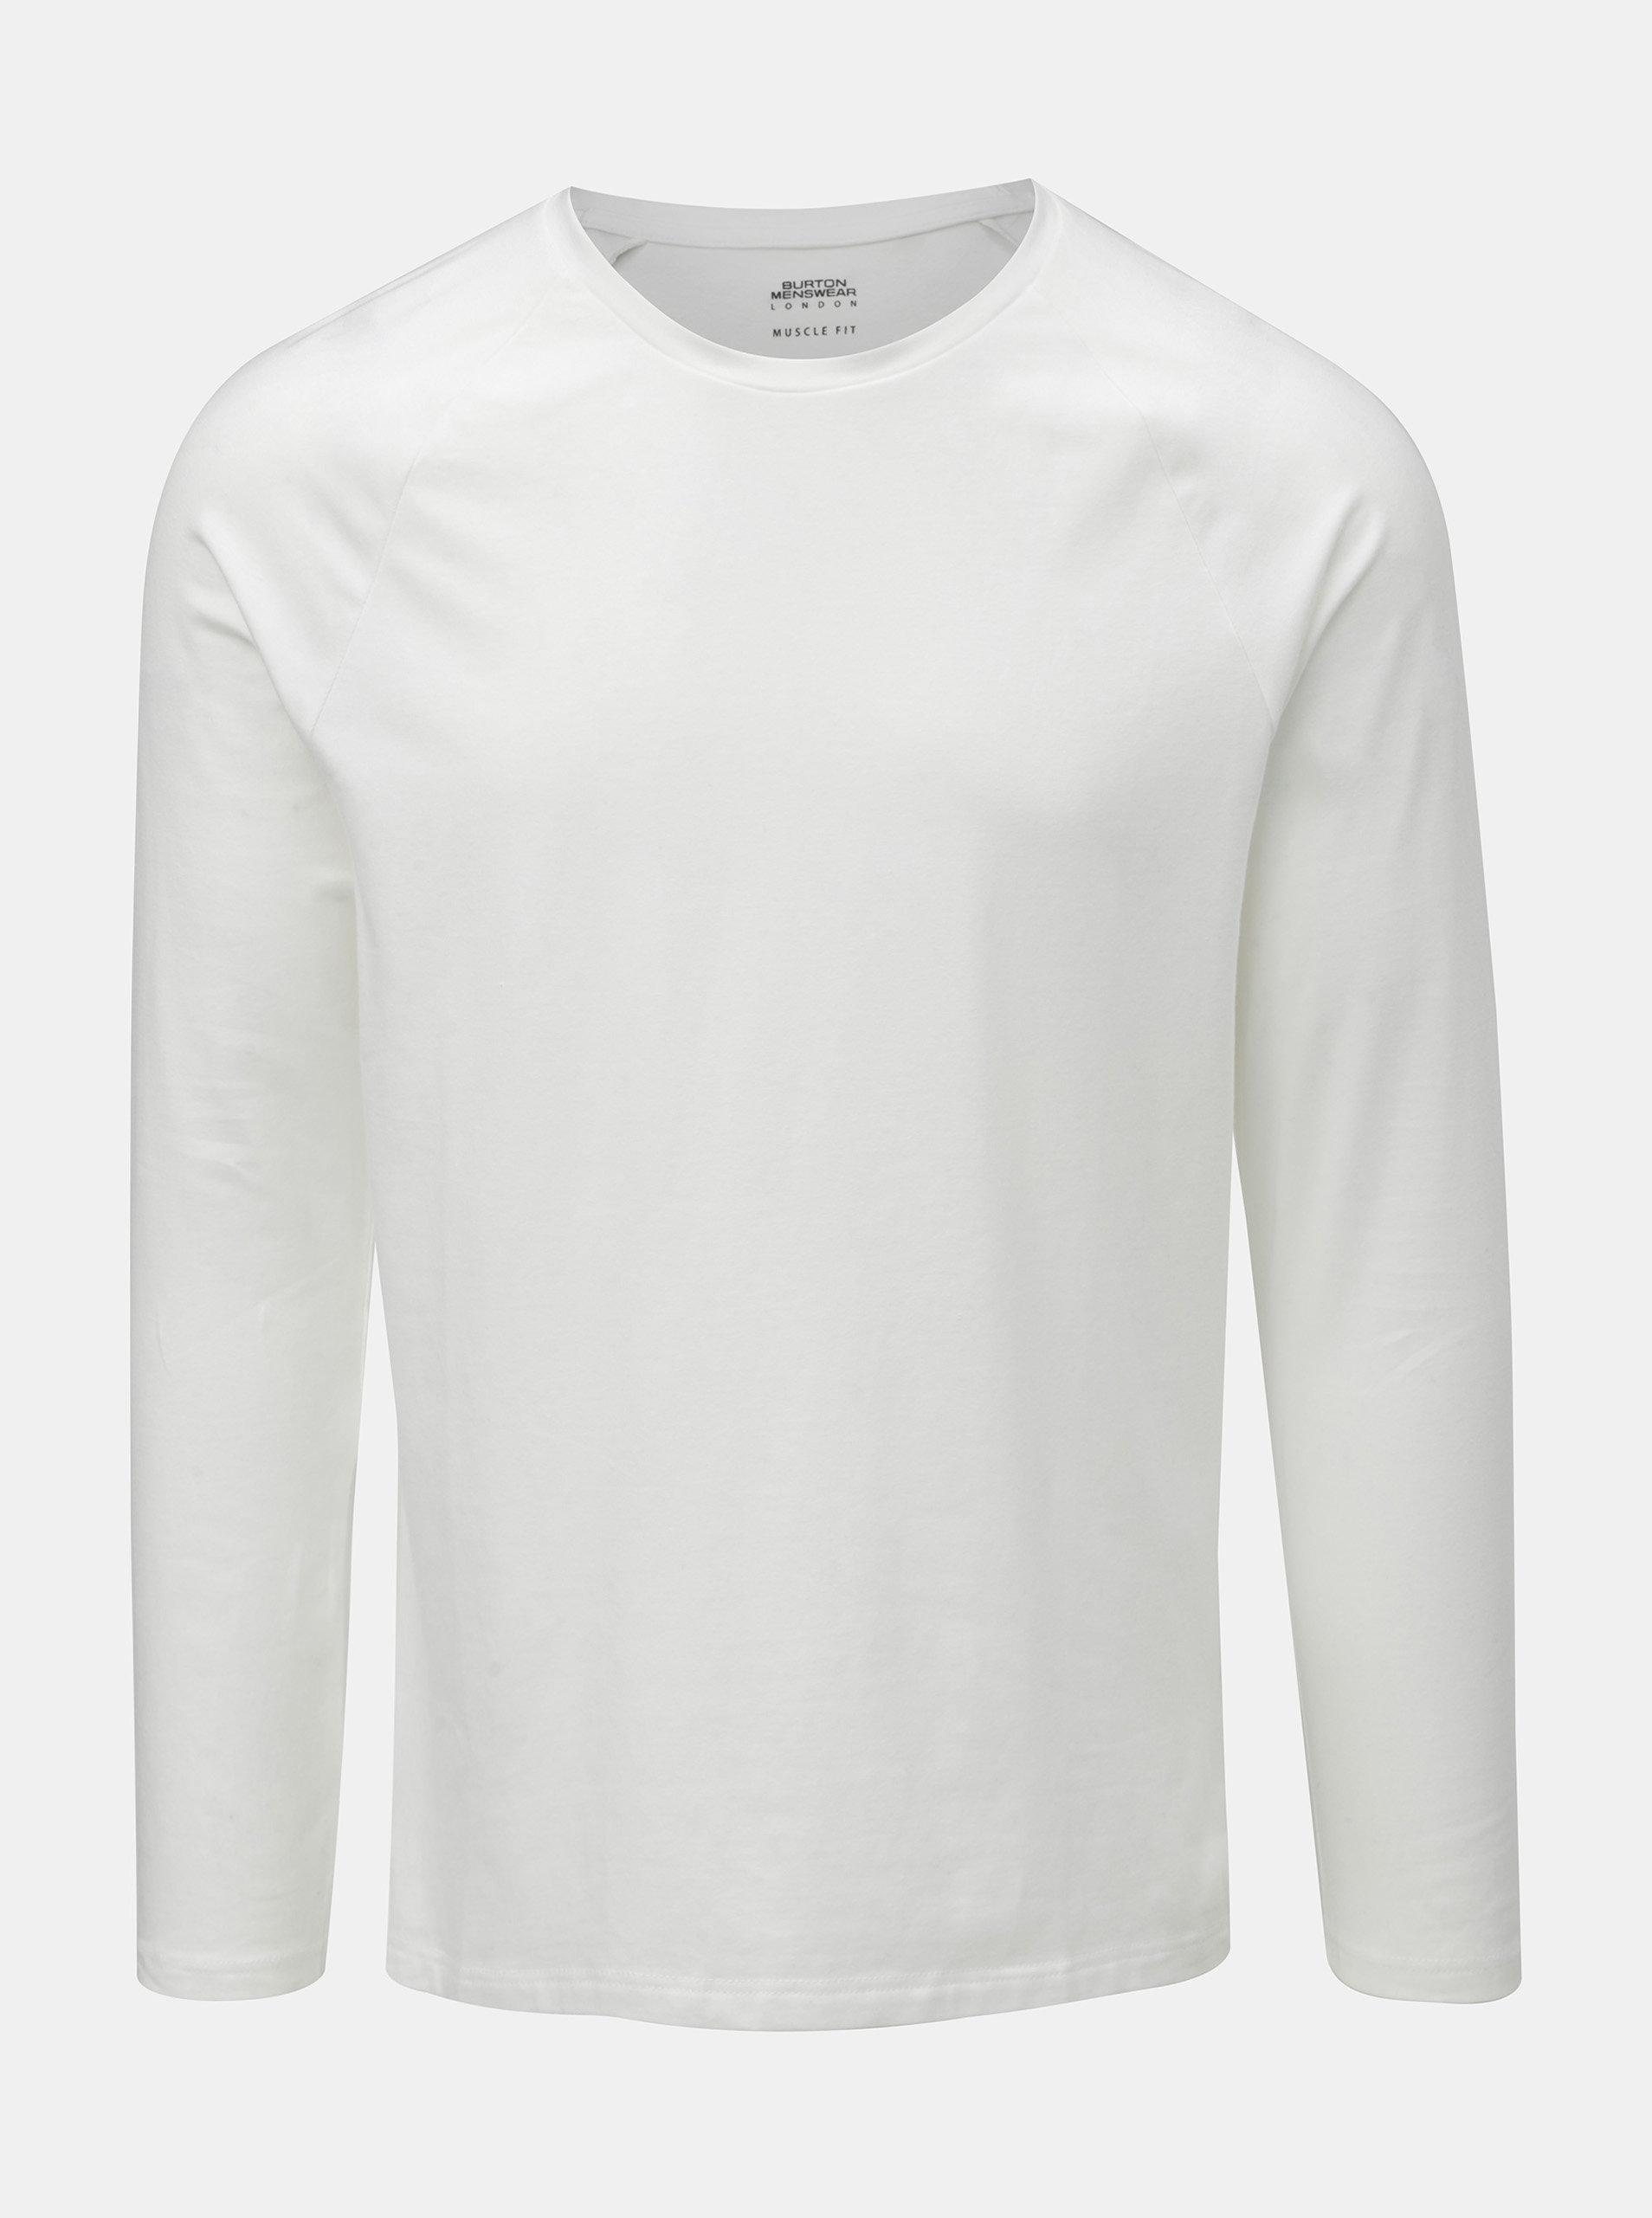 953f47a6a6a6 Biele basic muscle fit tričko s dlhým rukávom Burton Menswear London ...